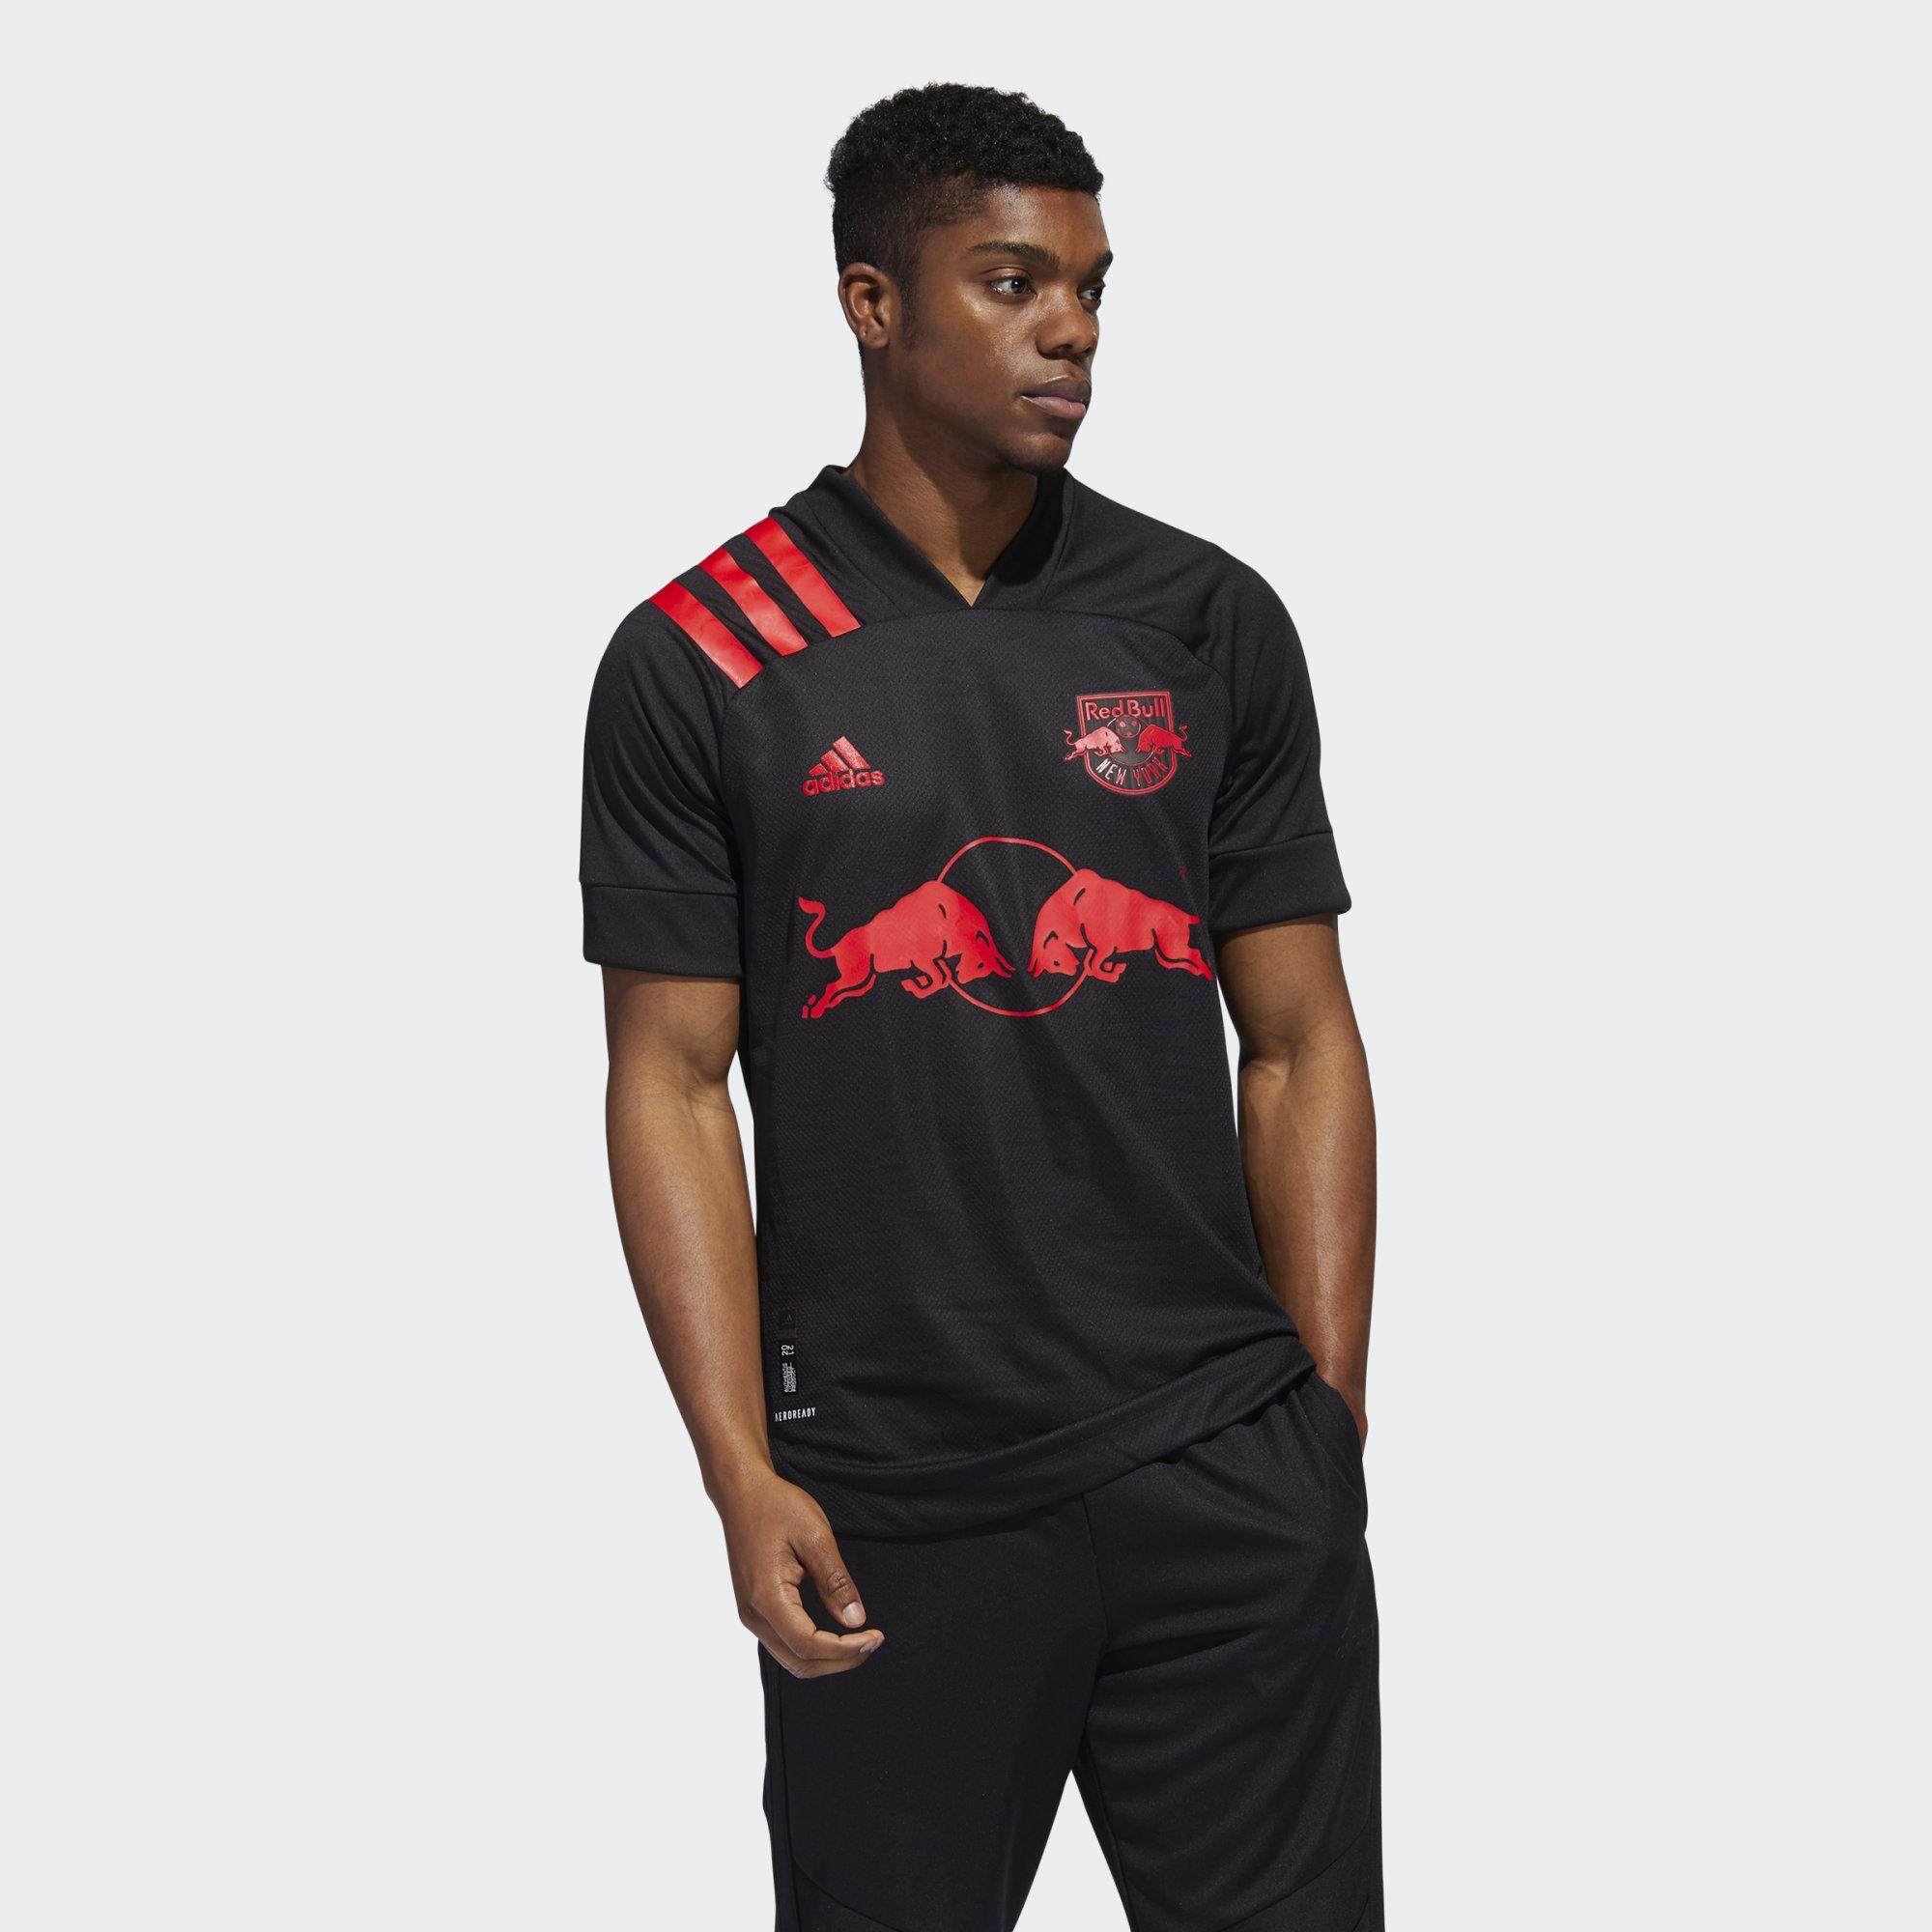 New York Red Bulls 2020-21 Adidas Away Kit | 20/21 Kits | Football ...